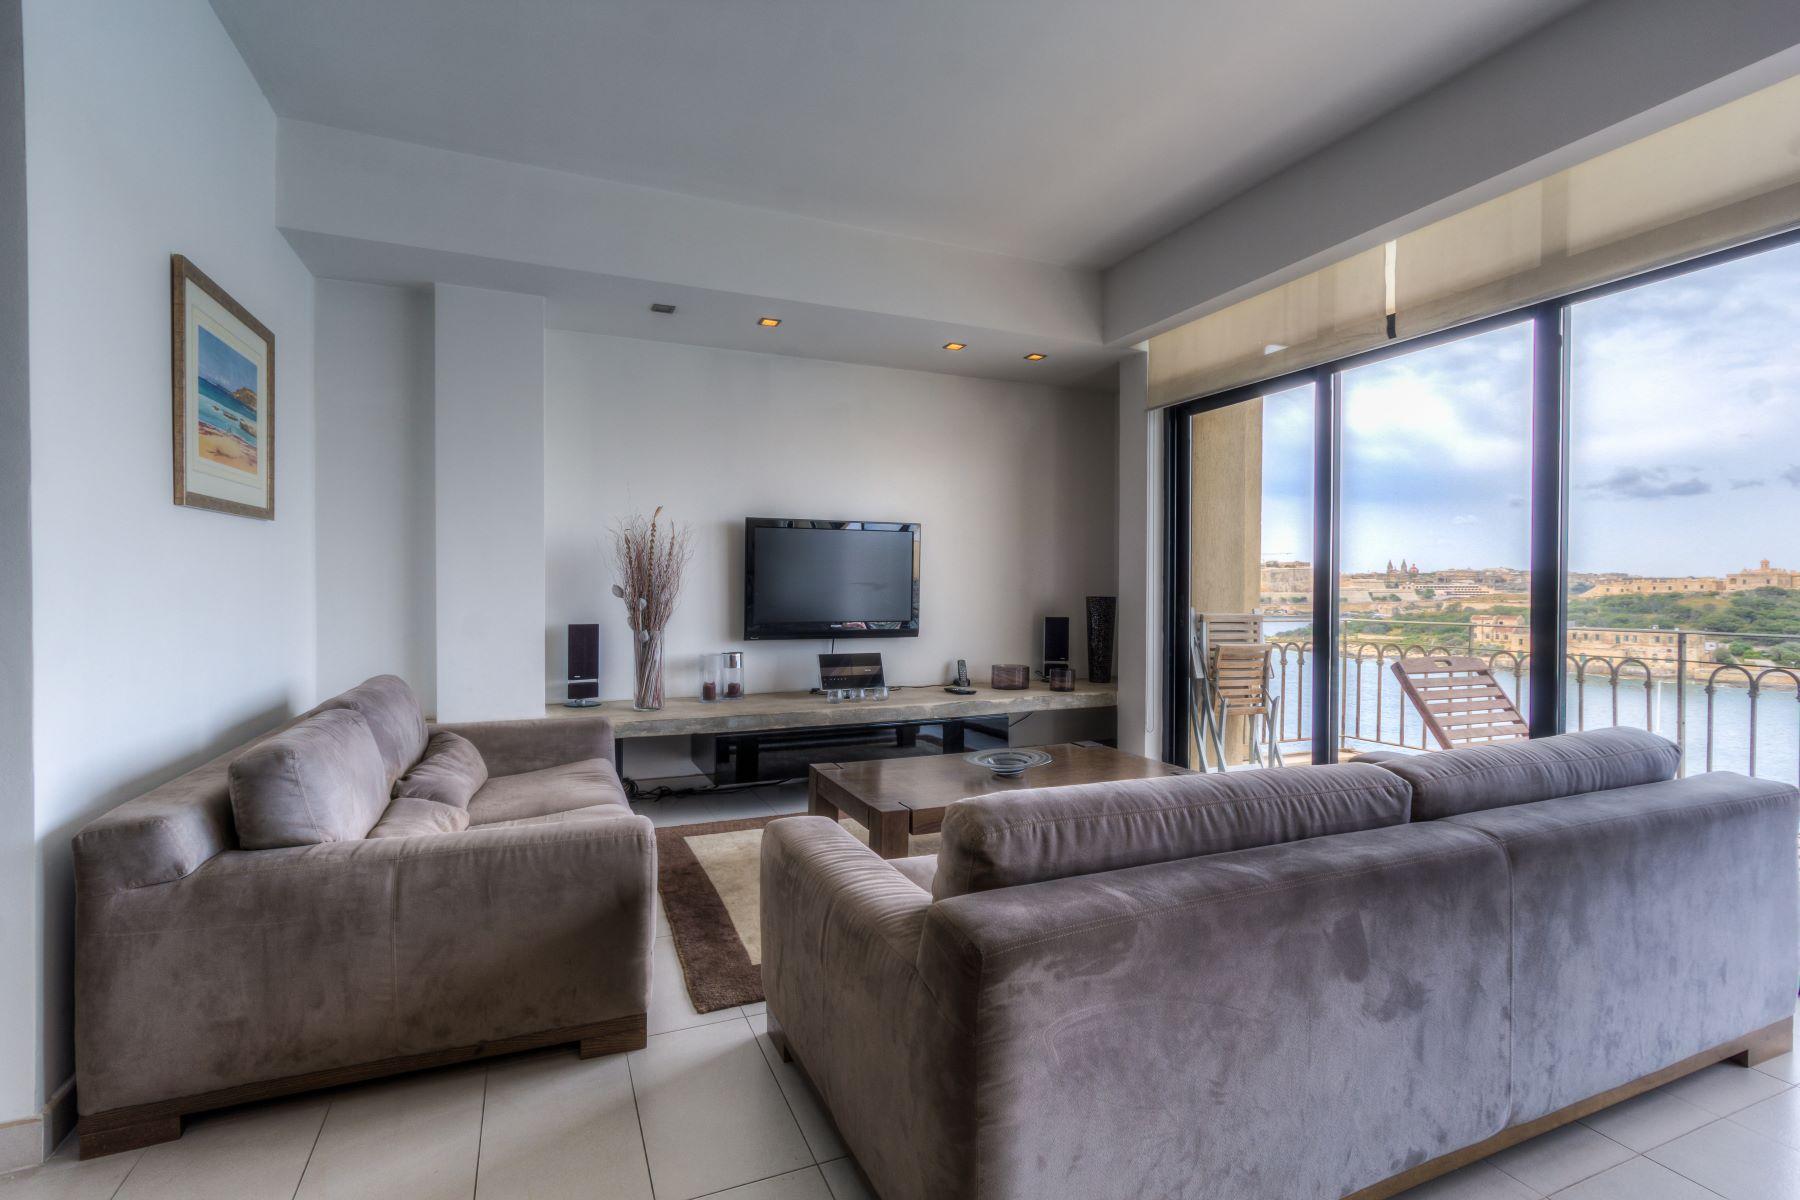 Apartment for Rent at Seafront Apartment Sliema, Malta Malta